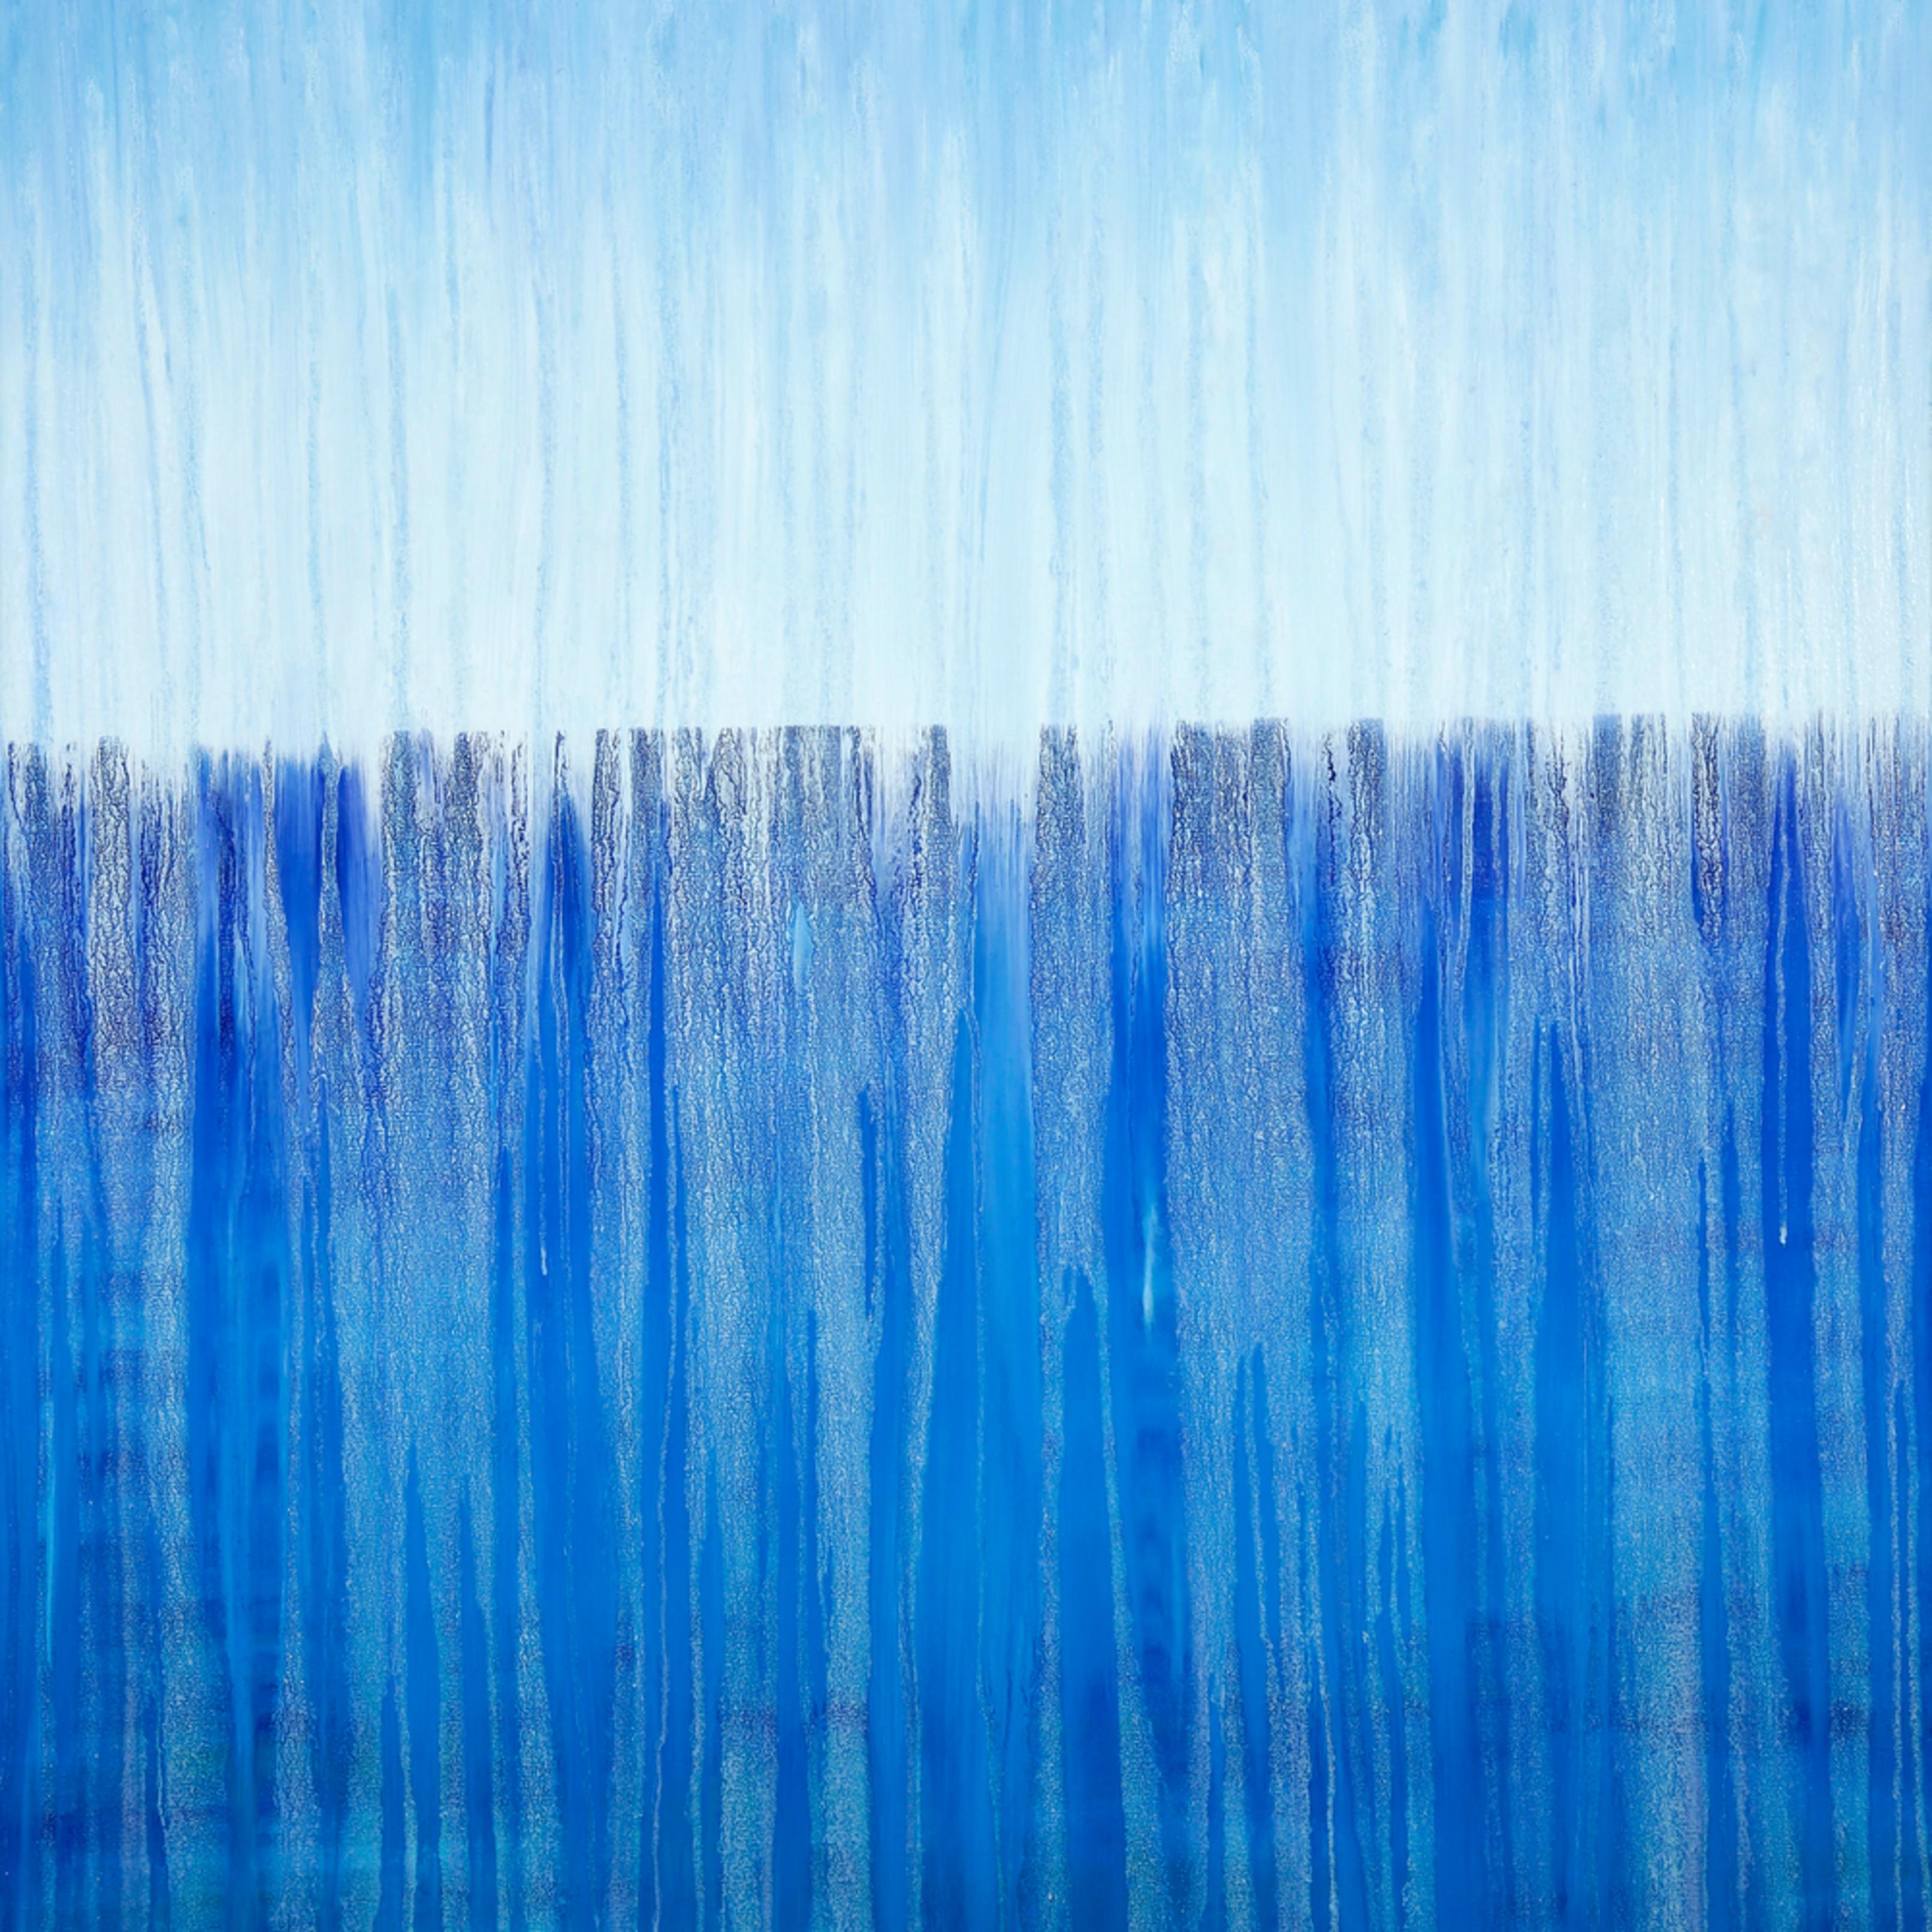 Rbrask rainymoment13 openoceanrain oilcanvas 30x40in qrgco0